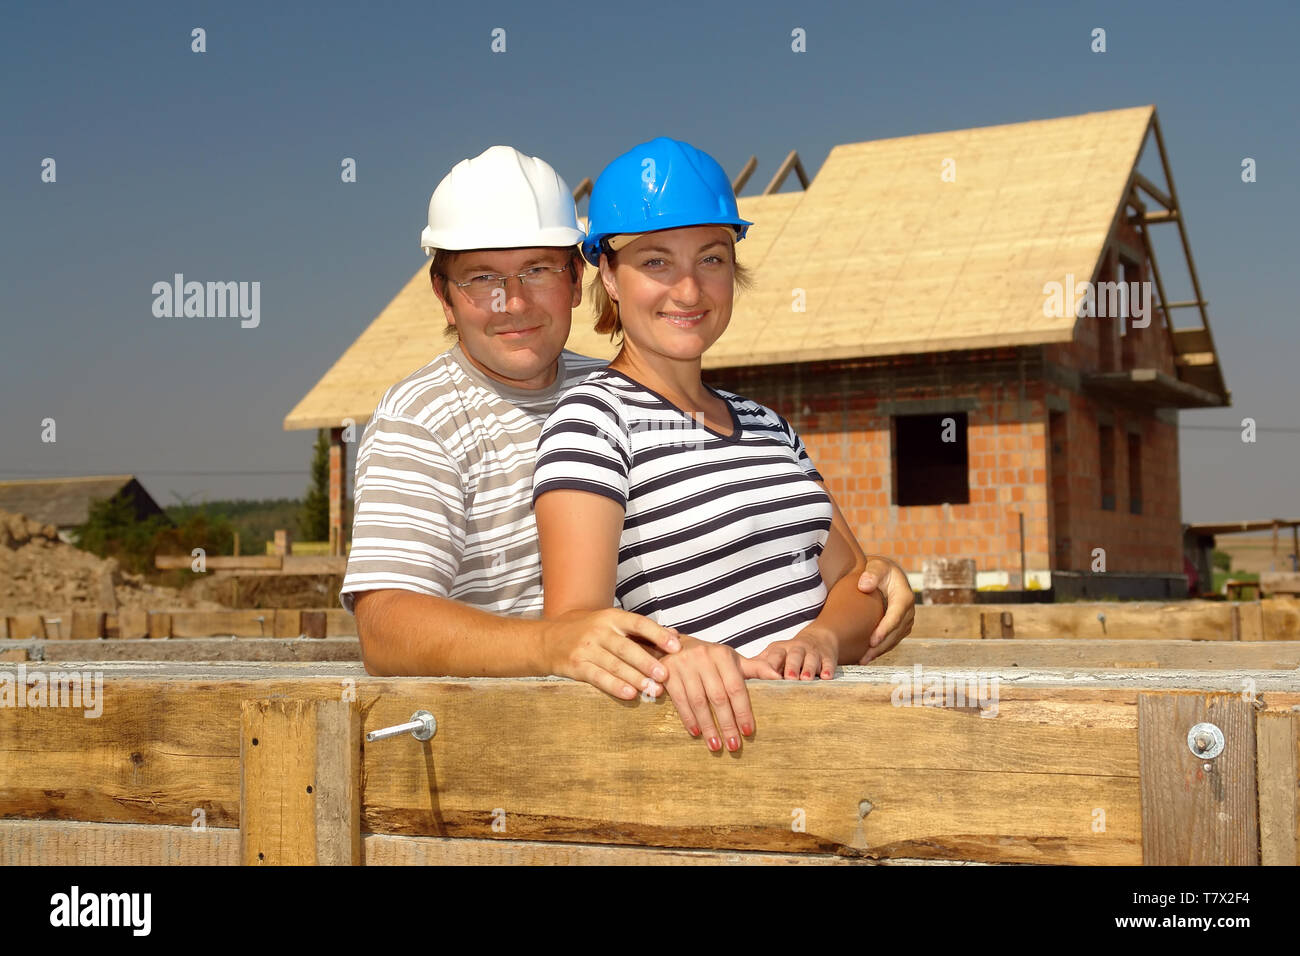 Couple wearing hard hats posing over unfinished house - Stock Image